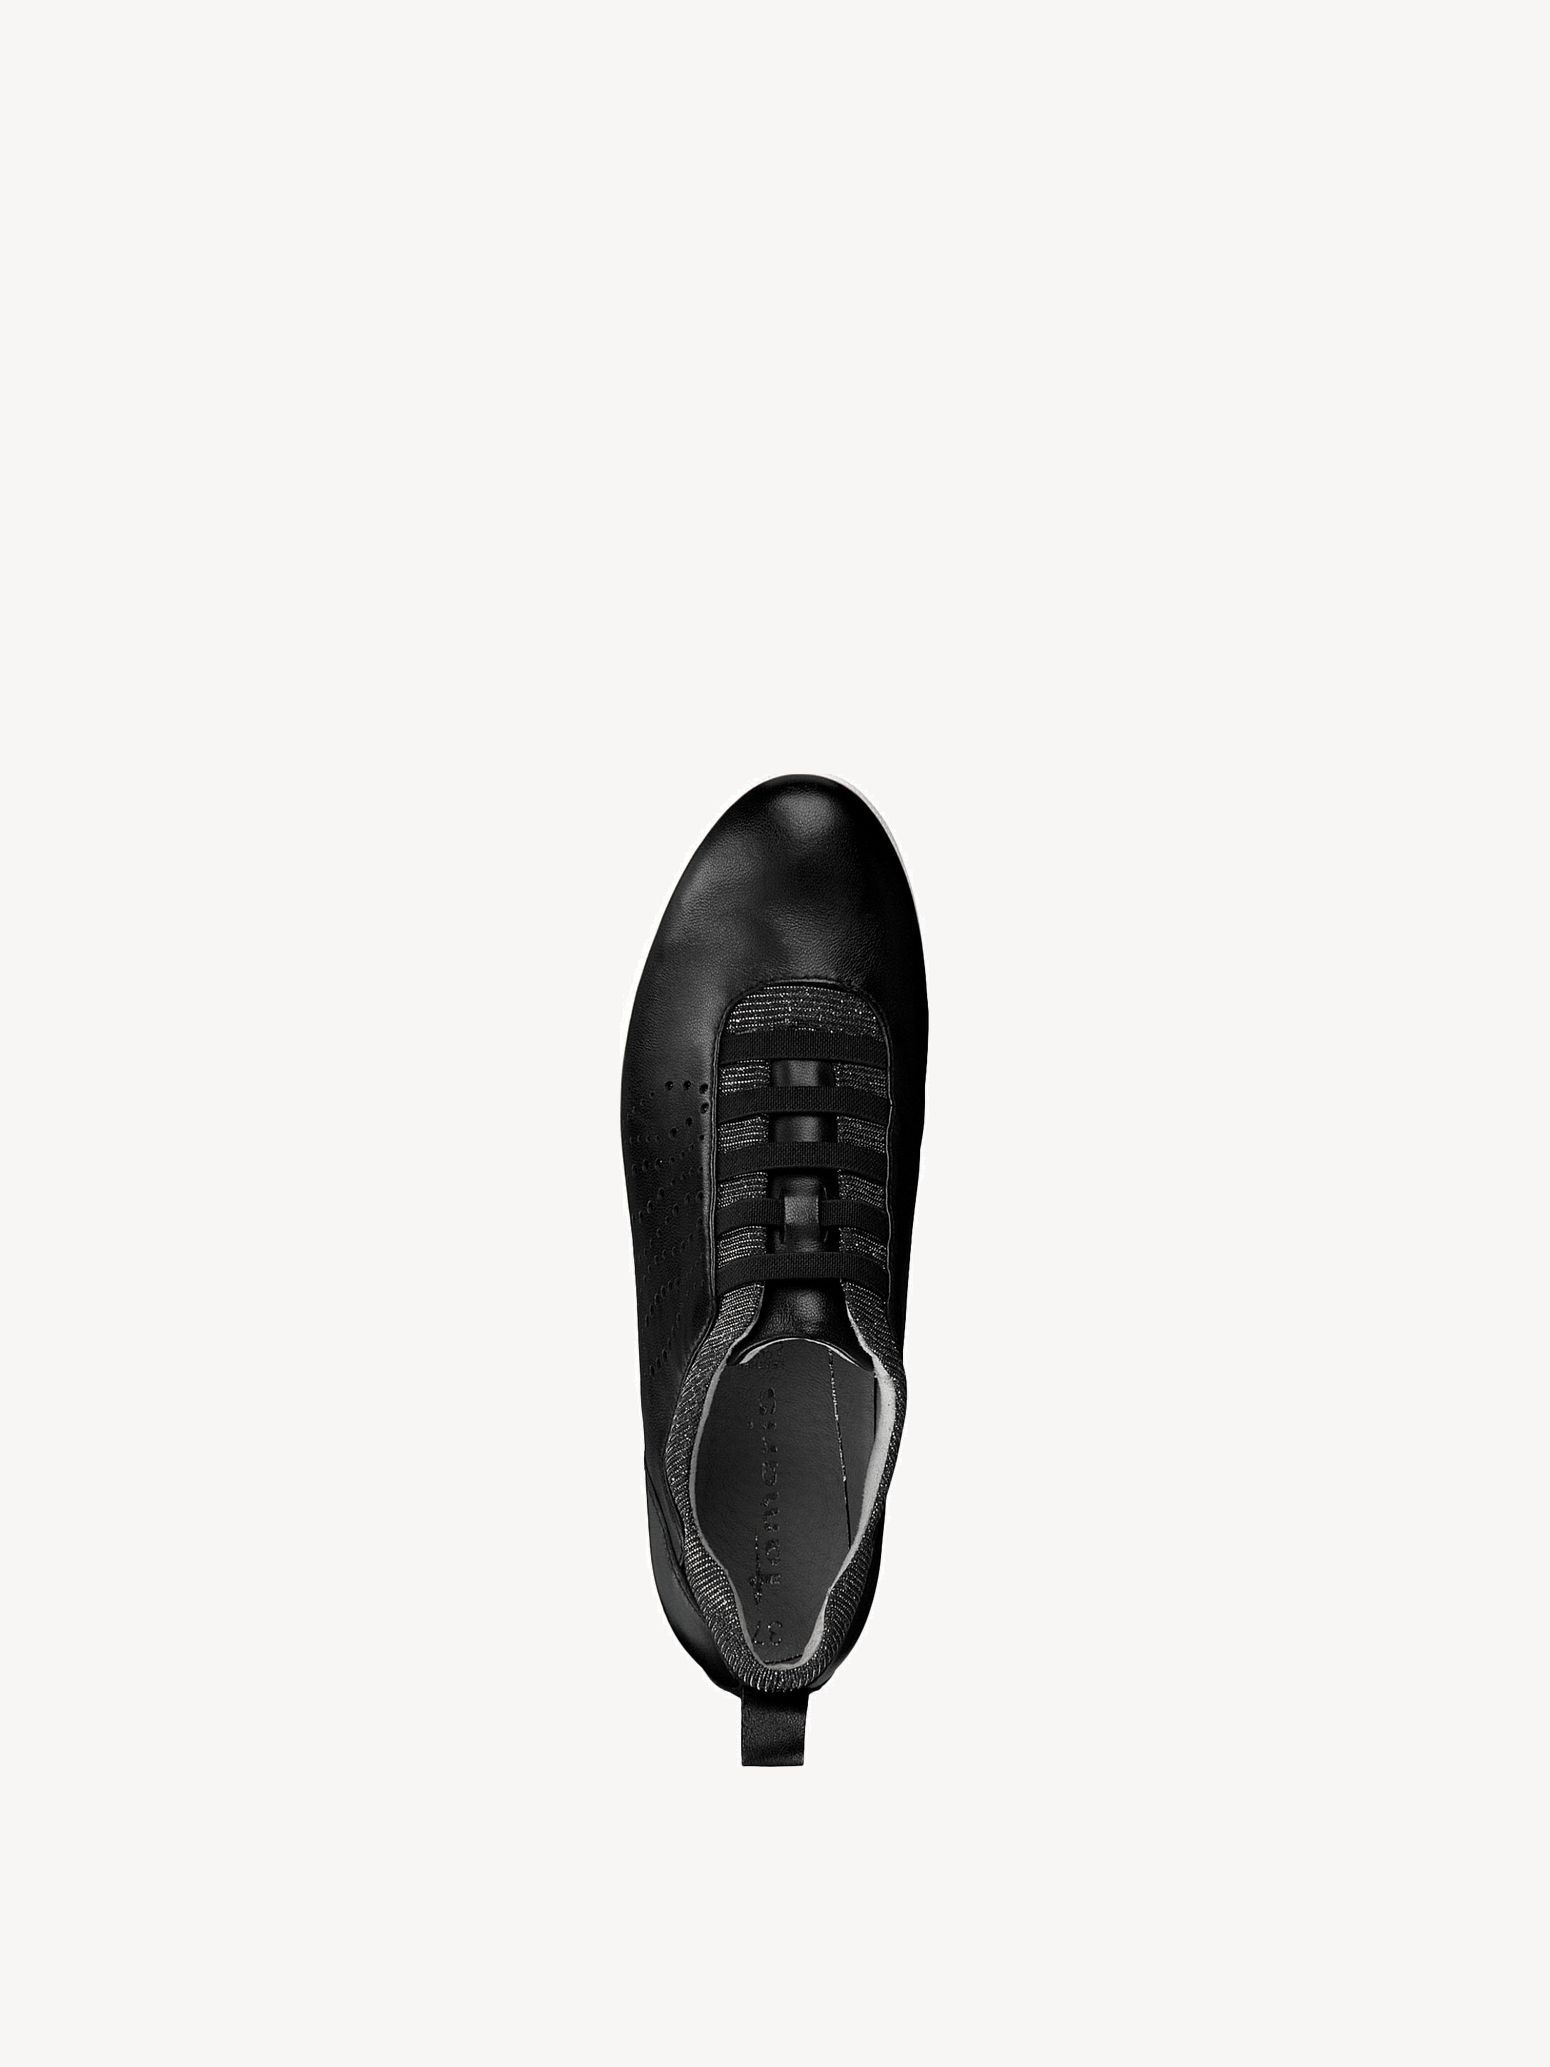 Tamaris 24629 Sneaker 1 Online Kaufen 22 Gini wB5tqgq